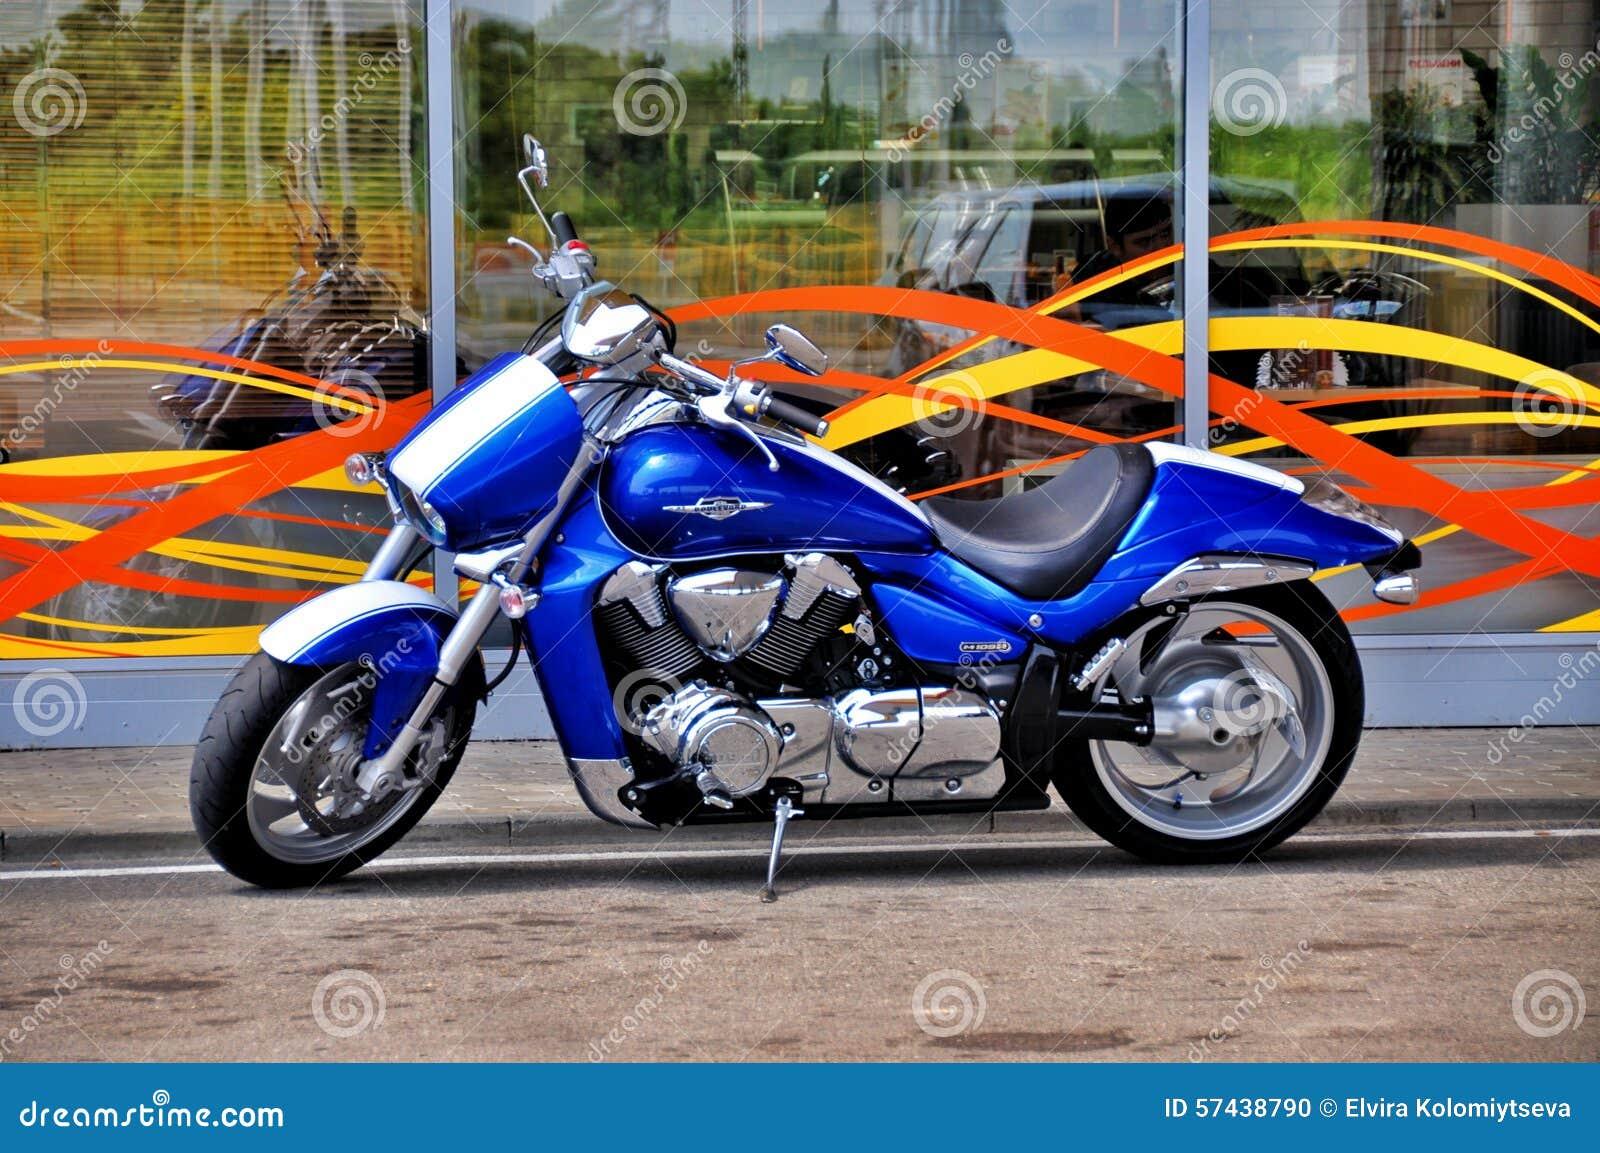 Suzuki Boulevard Motorcycle Prices